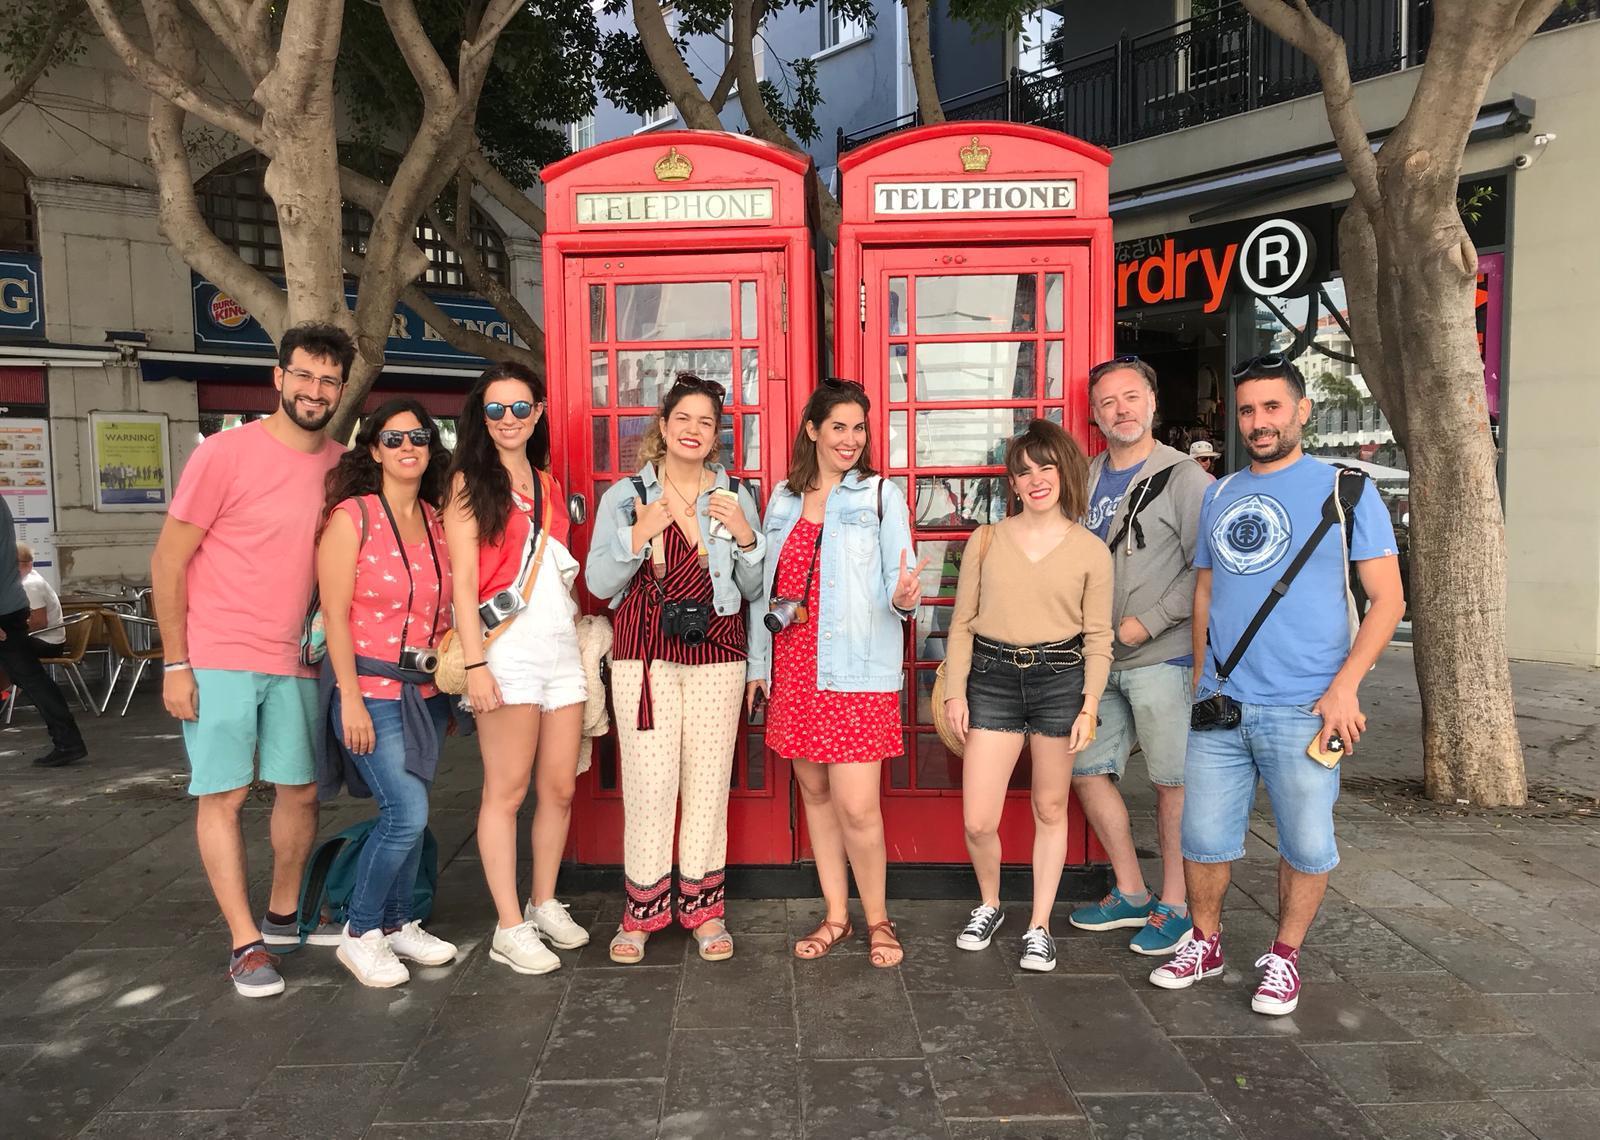 23-jun-2019-blogueros-espaoles-de-viajes-visitan-el-pen_48131153217_o